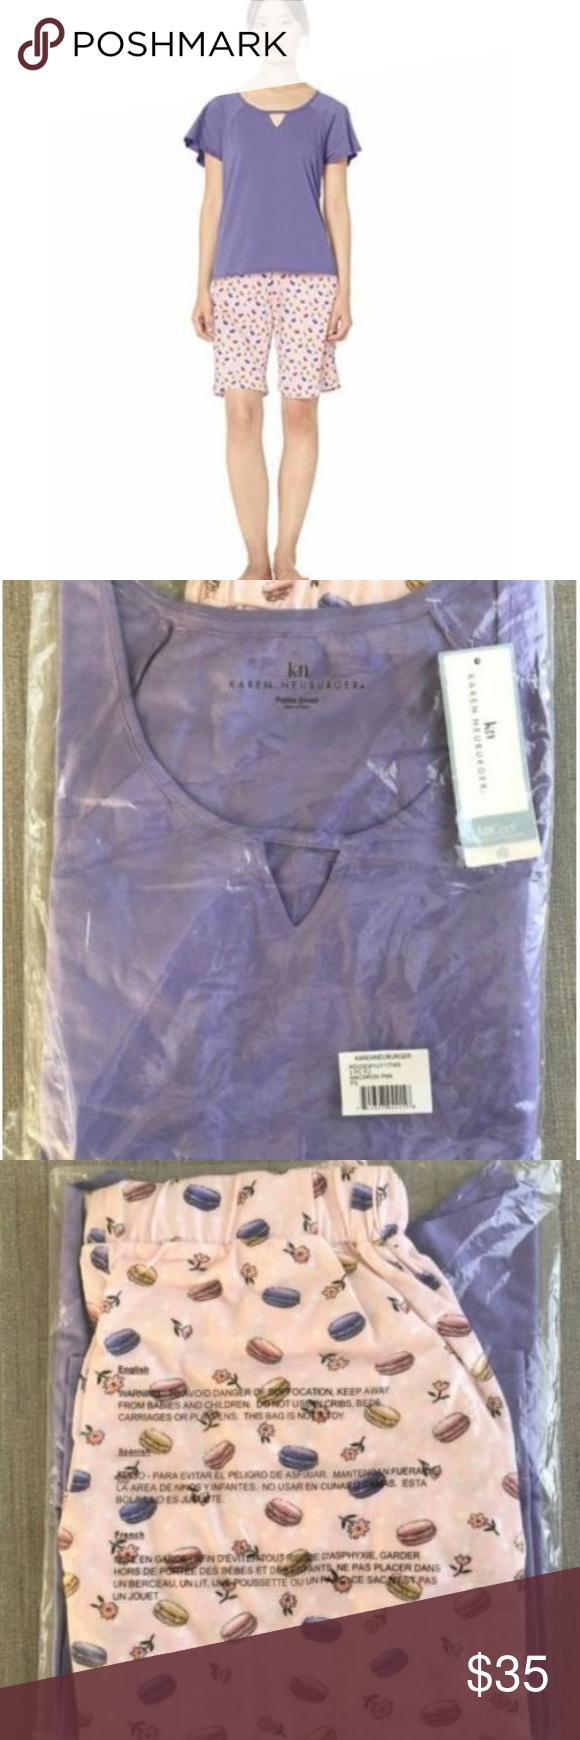 Karen Neuburger Womens Short Sleeve Top and Bermuda Pj Set with Wicking Technology